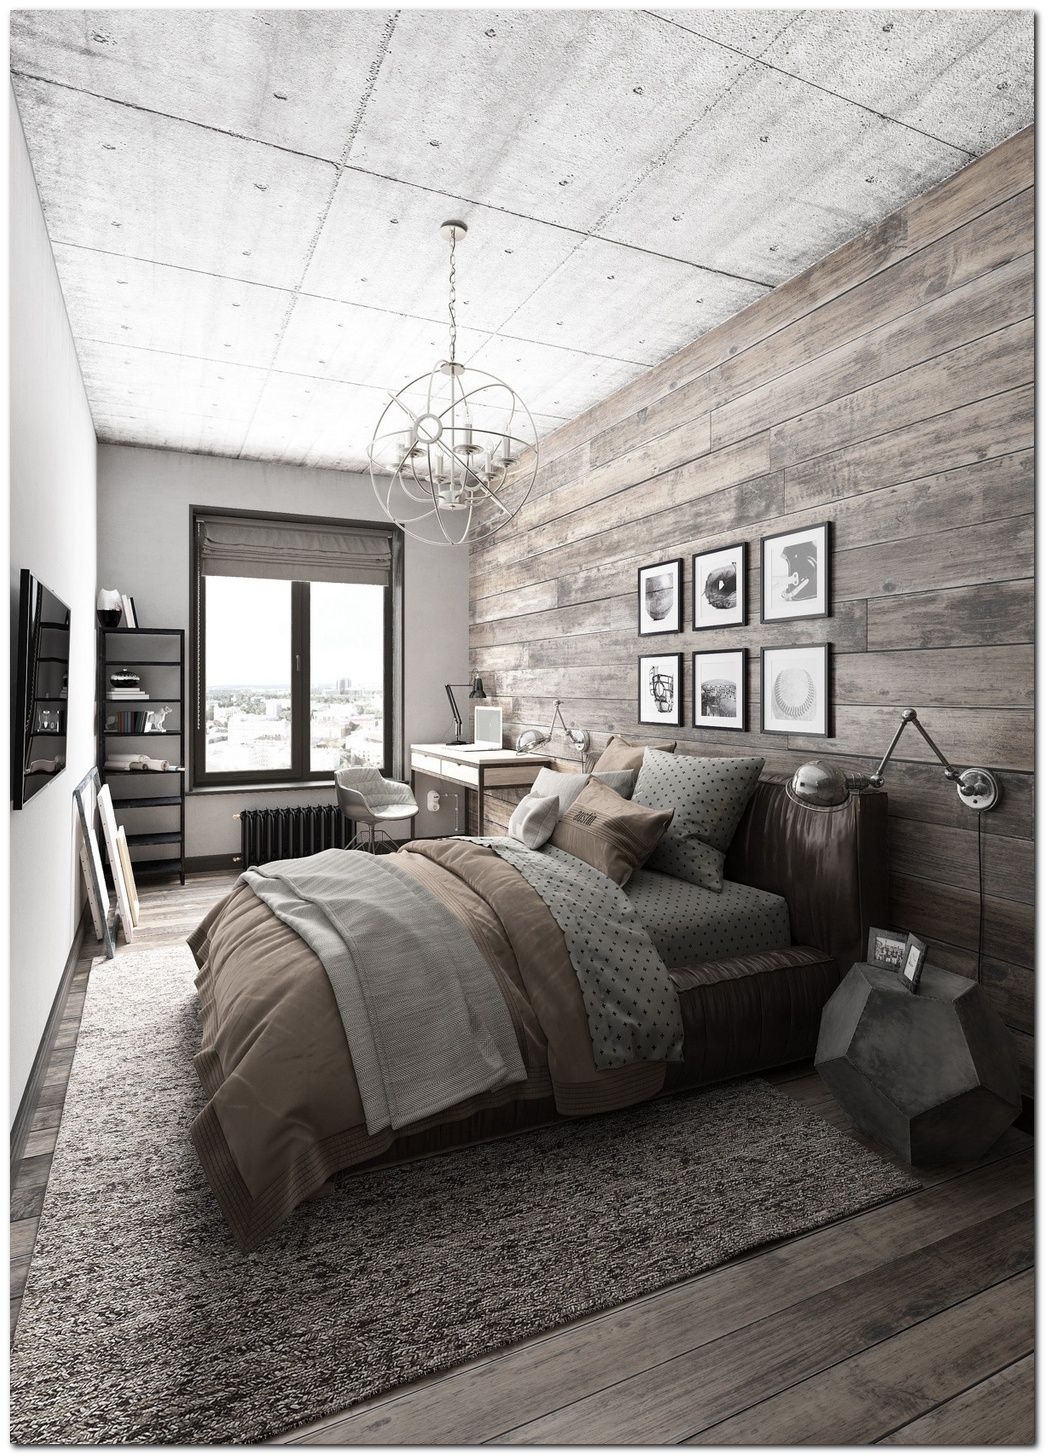 Best Kitchen Gallery: 70 Ideas For Industrial Bedroom Interior Industrial Bedroom of Interior Design Bedroom Ideas  on rachelxblog.com